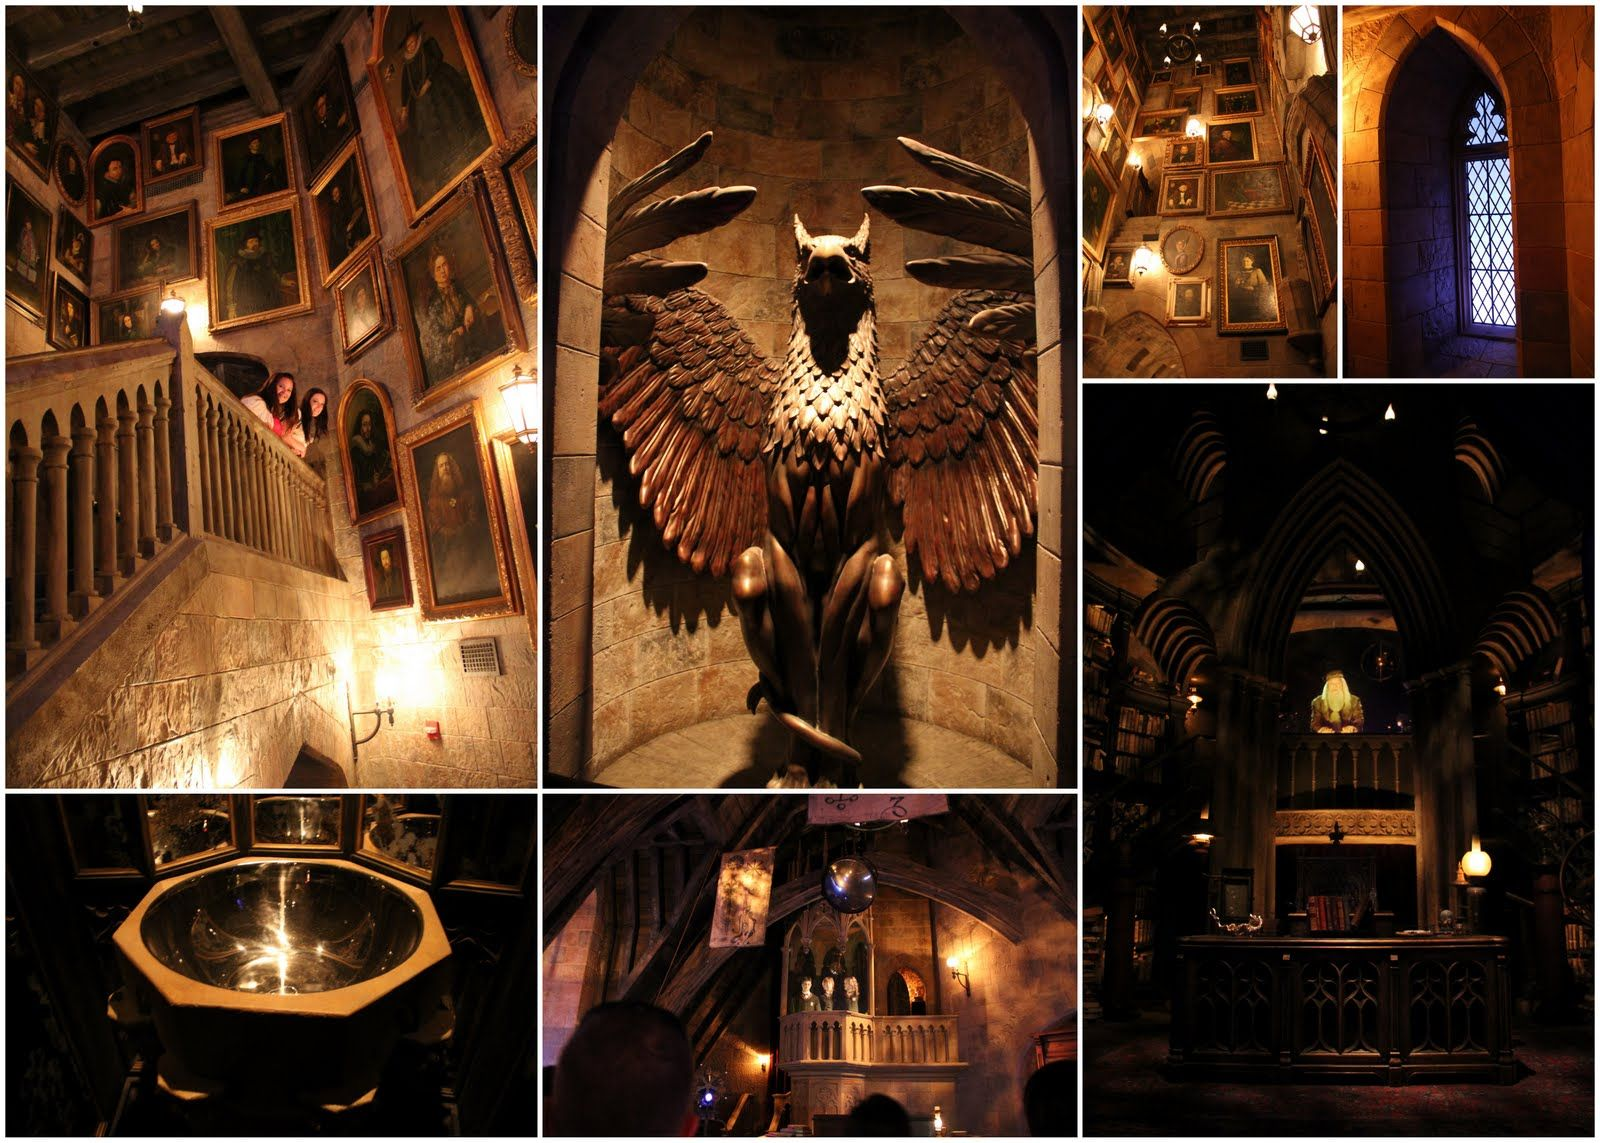 inside Castle | Harry Potter Castle Inside